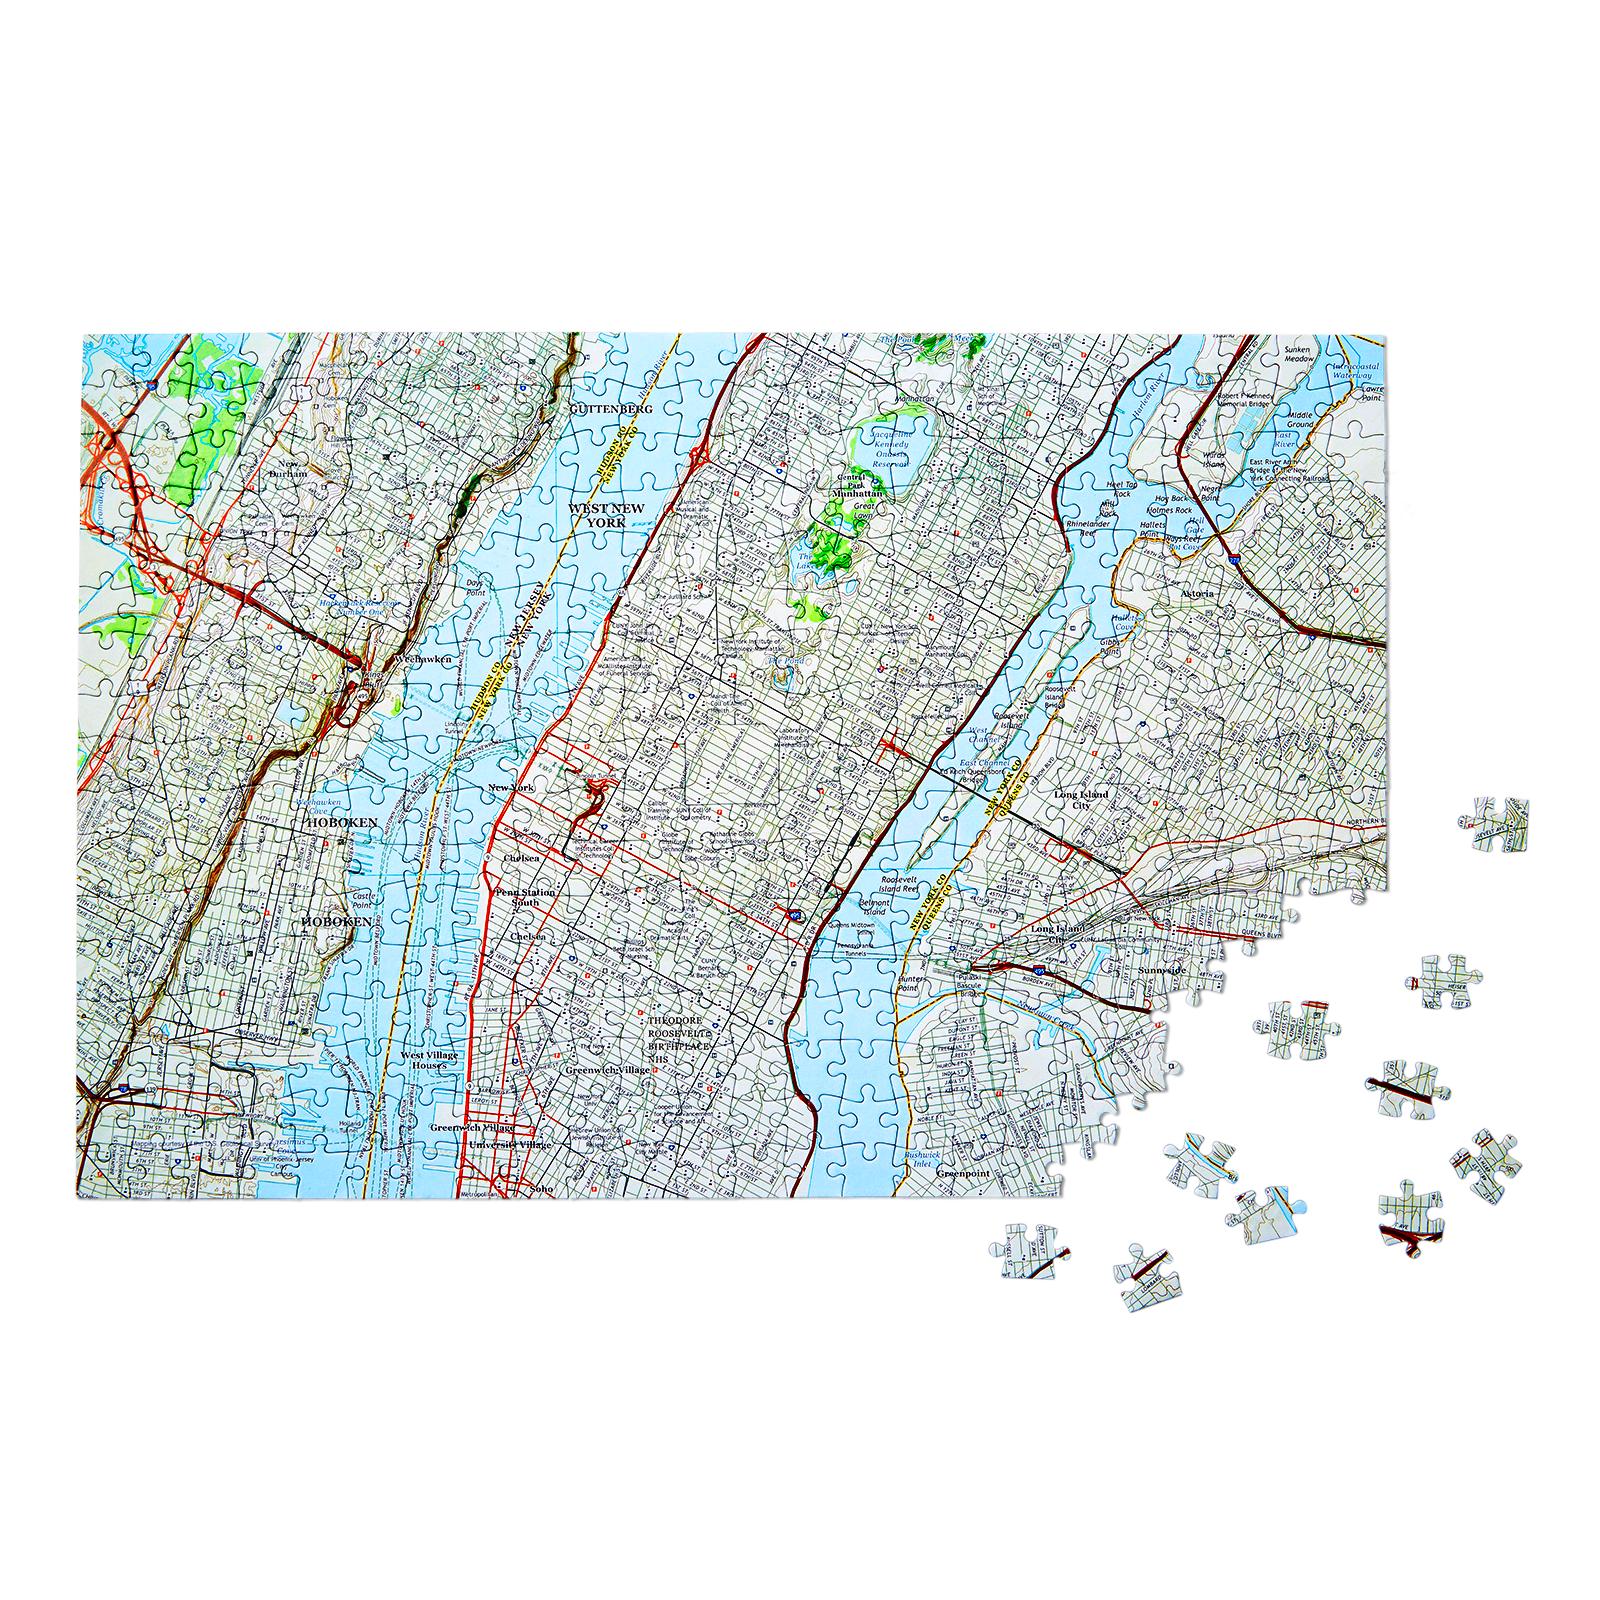 $50 christmas gift ideas australia map